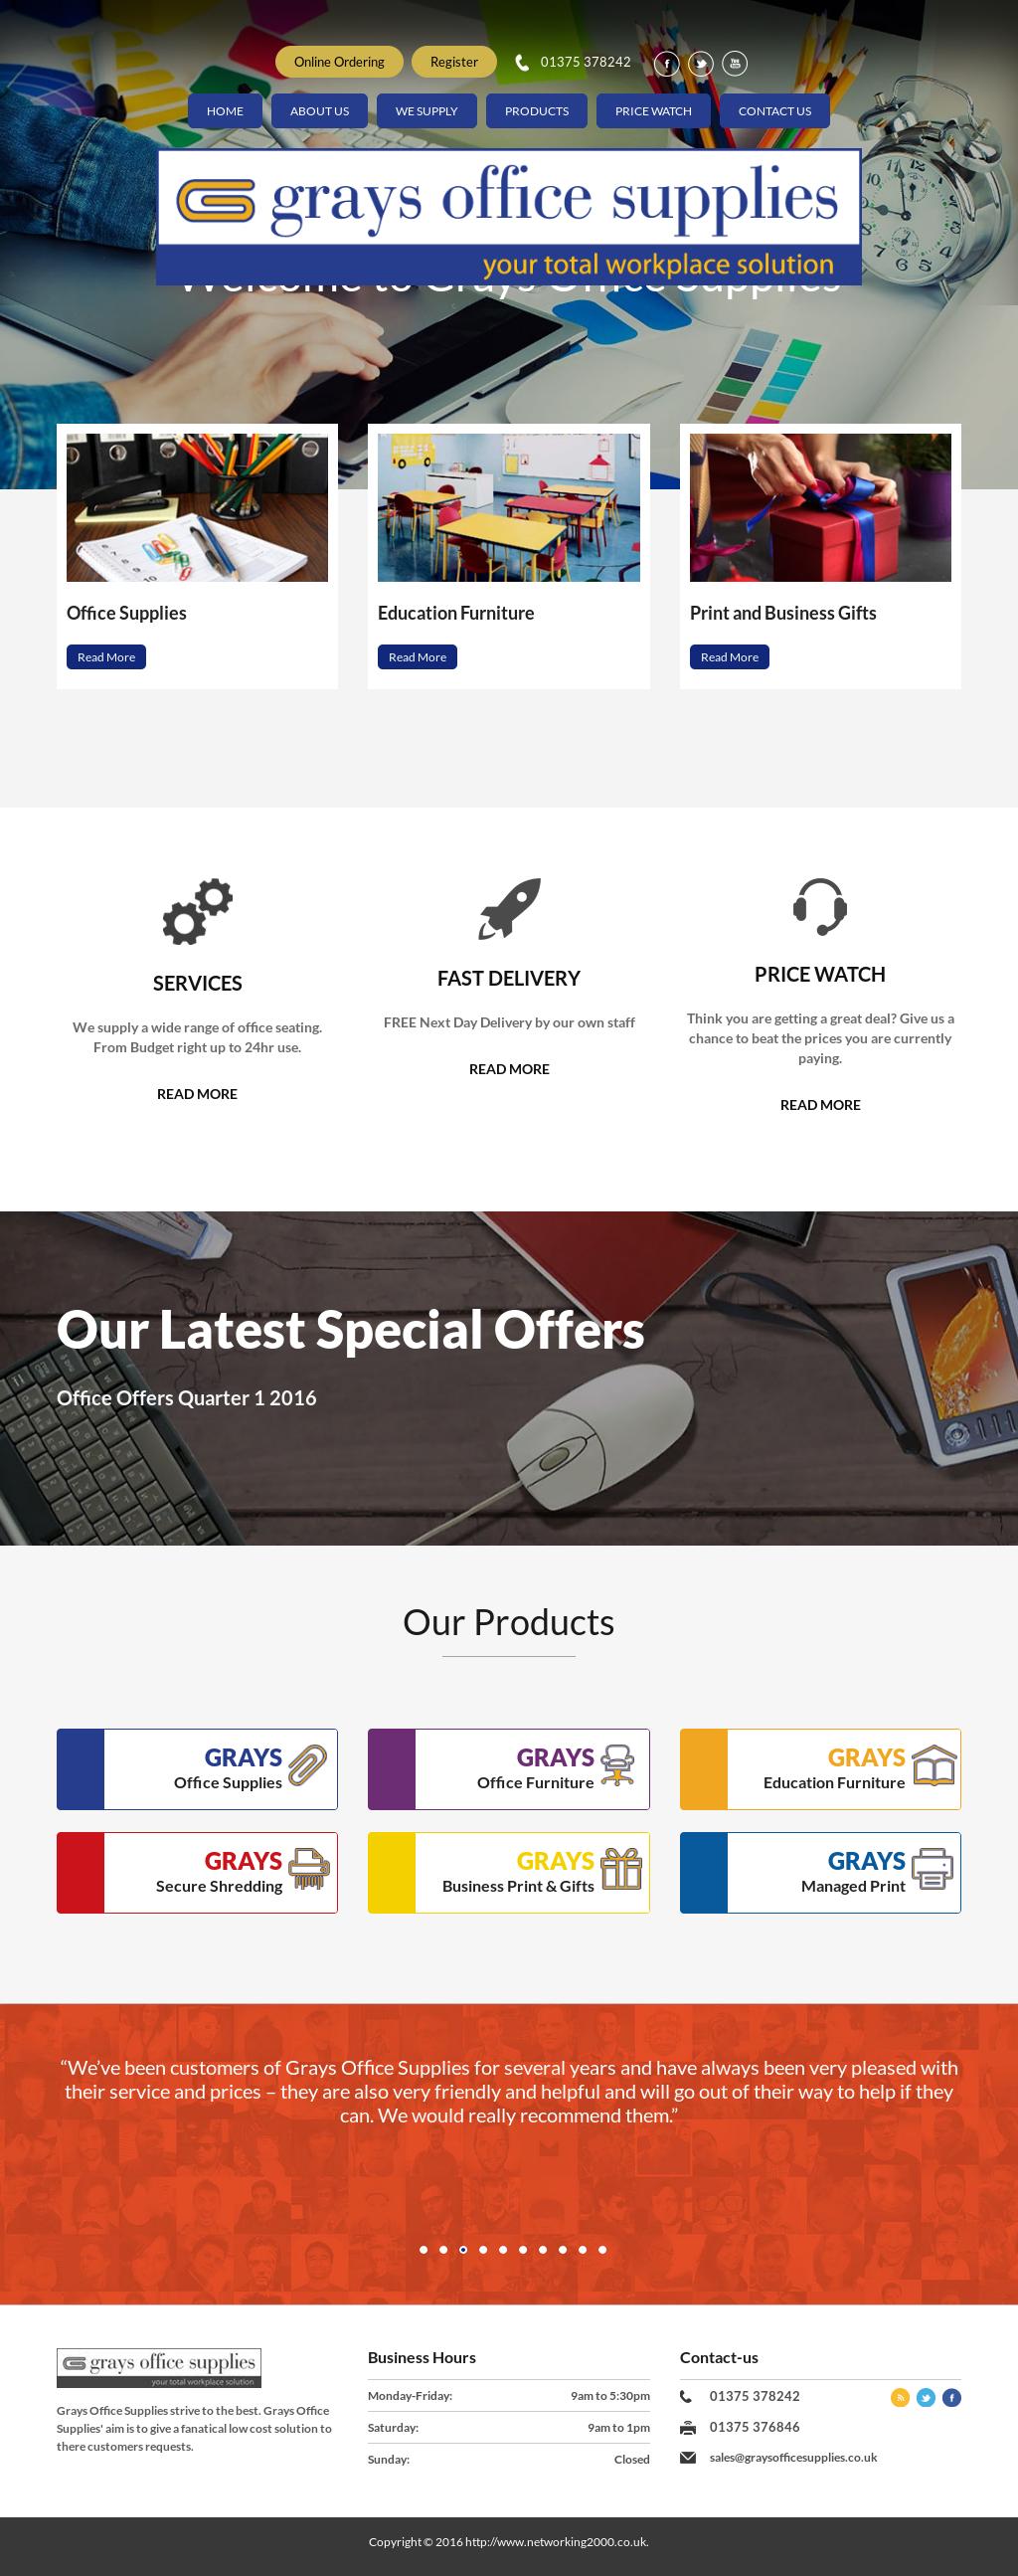 Grays Office Supplies Website History